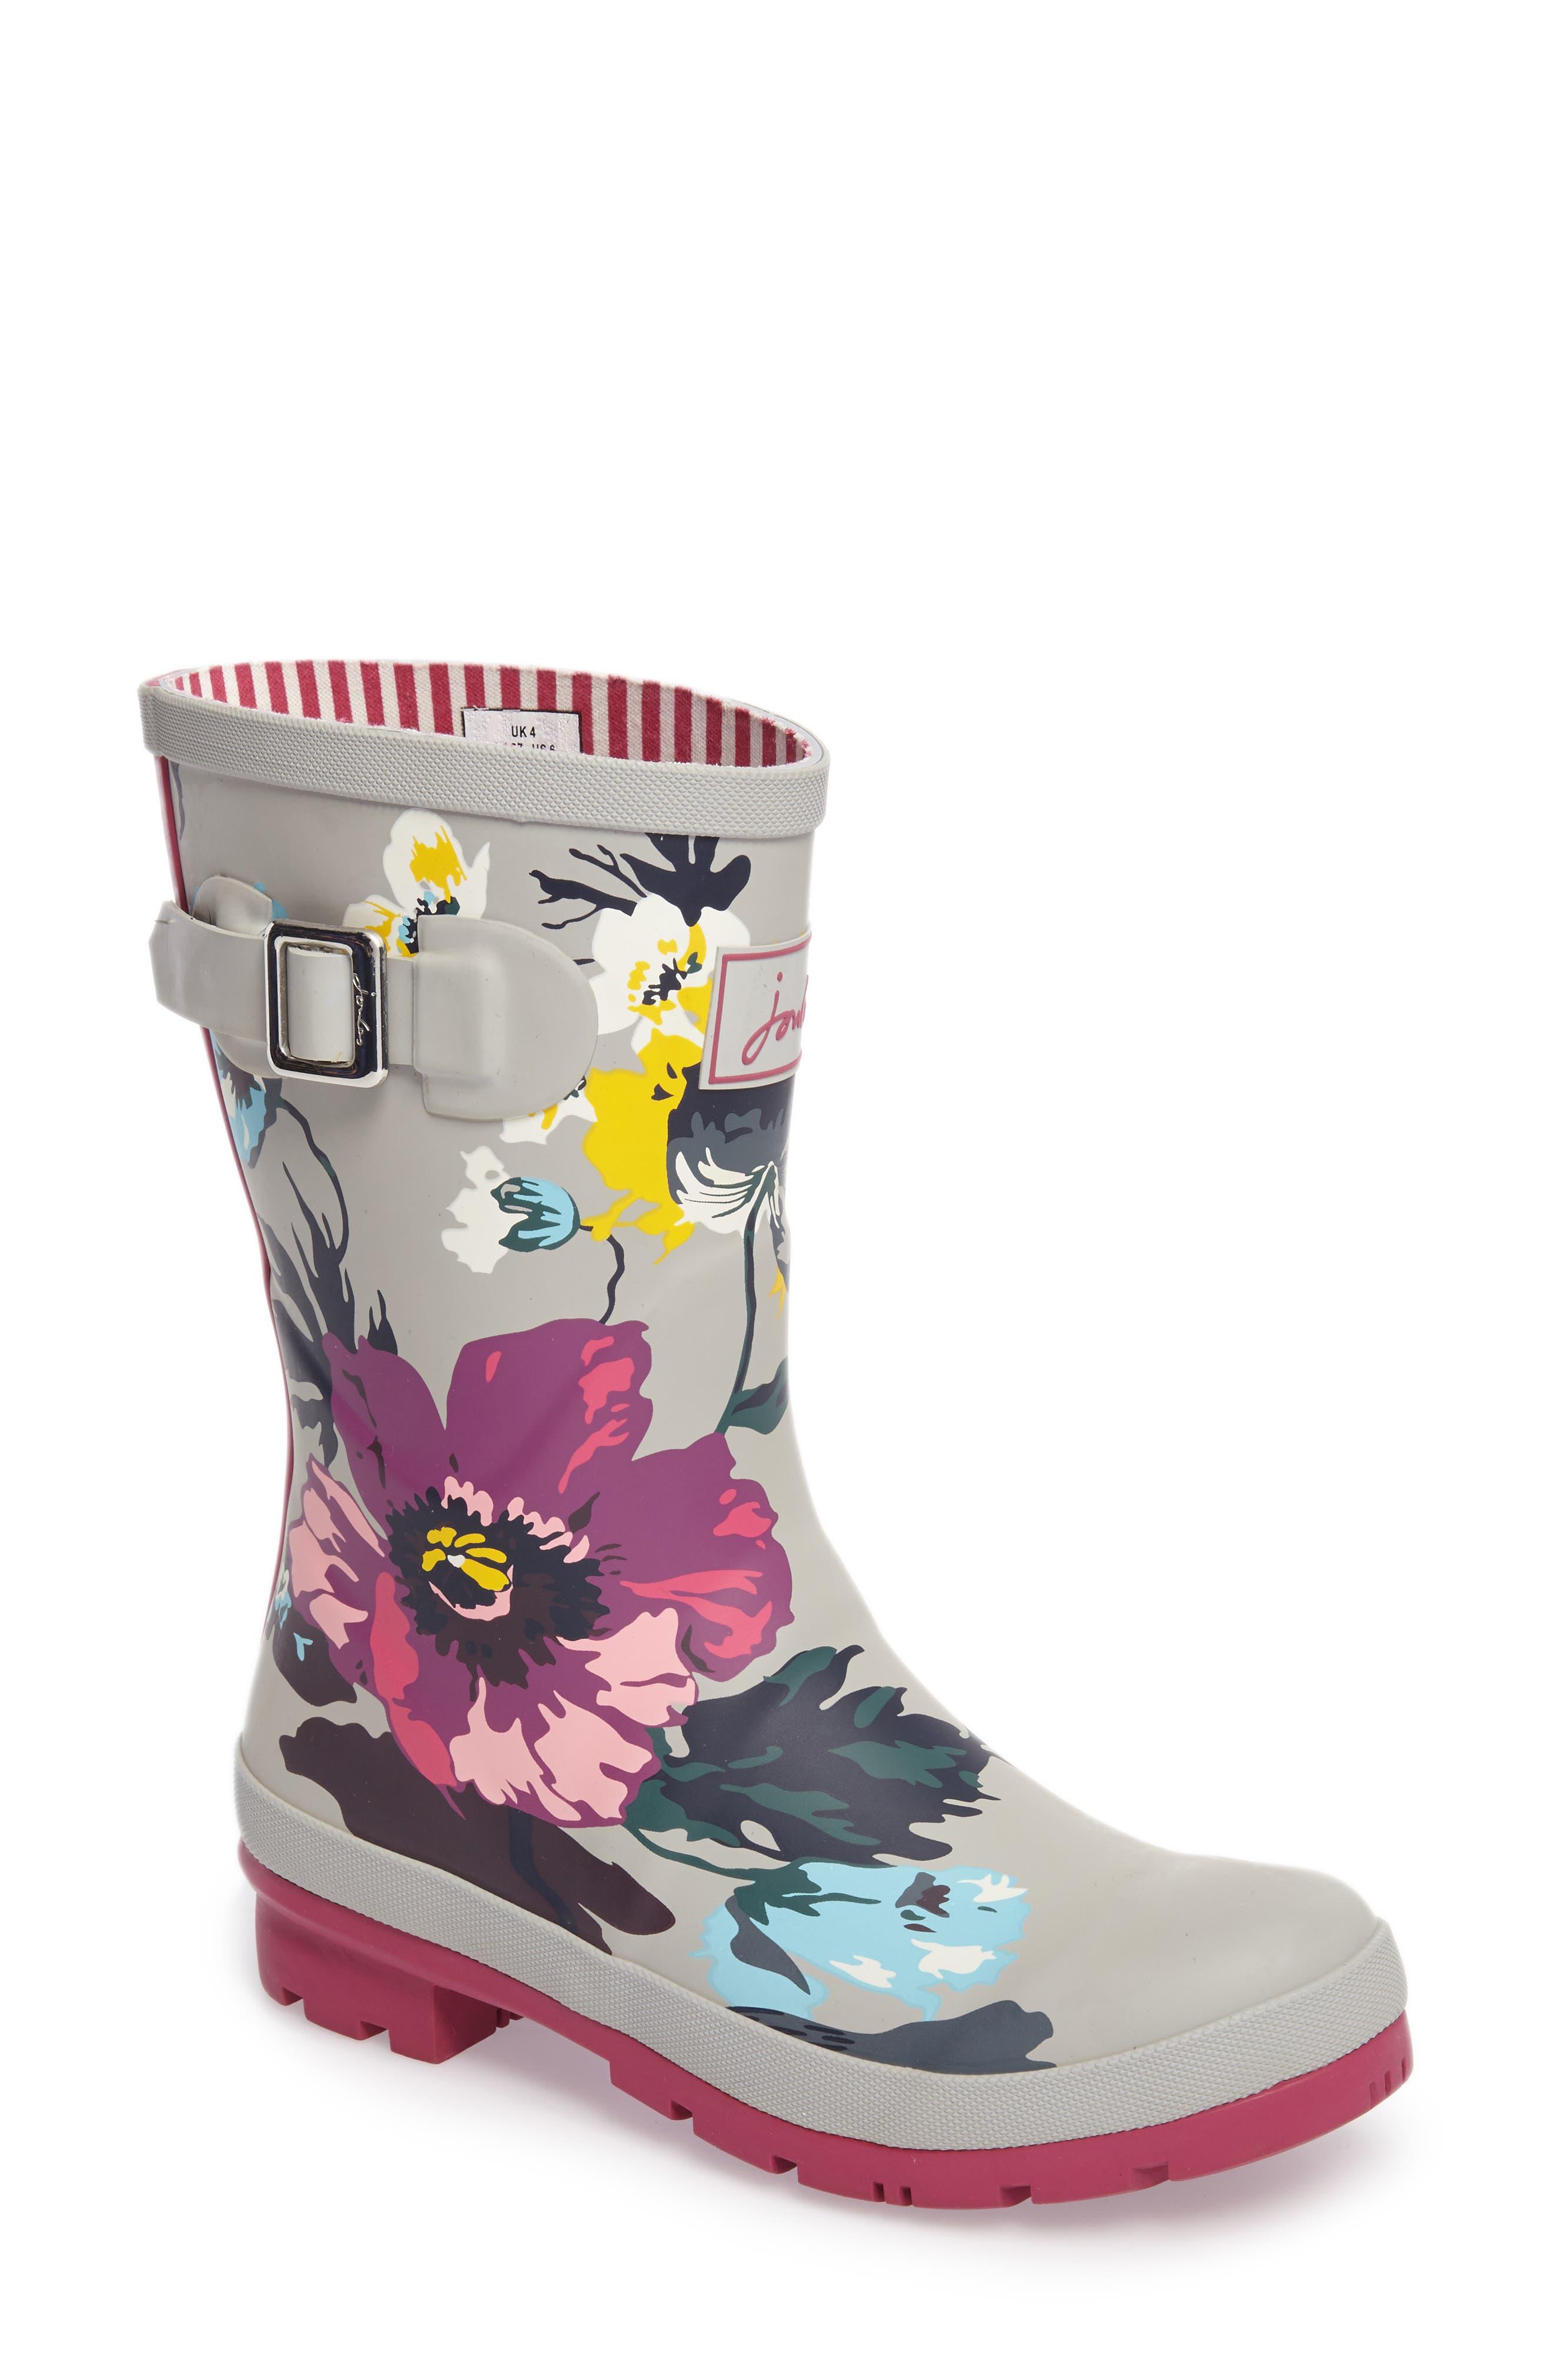 Alternate Image 1 Selected - Joules 'Molly' Rain Boot (Women)